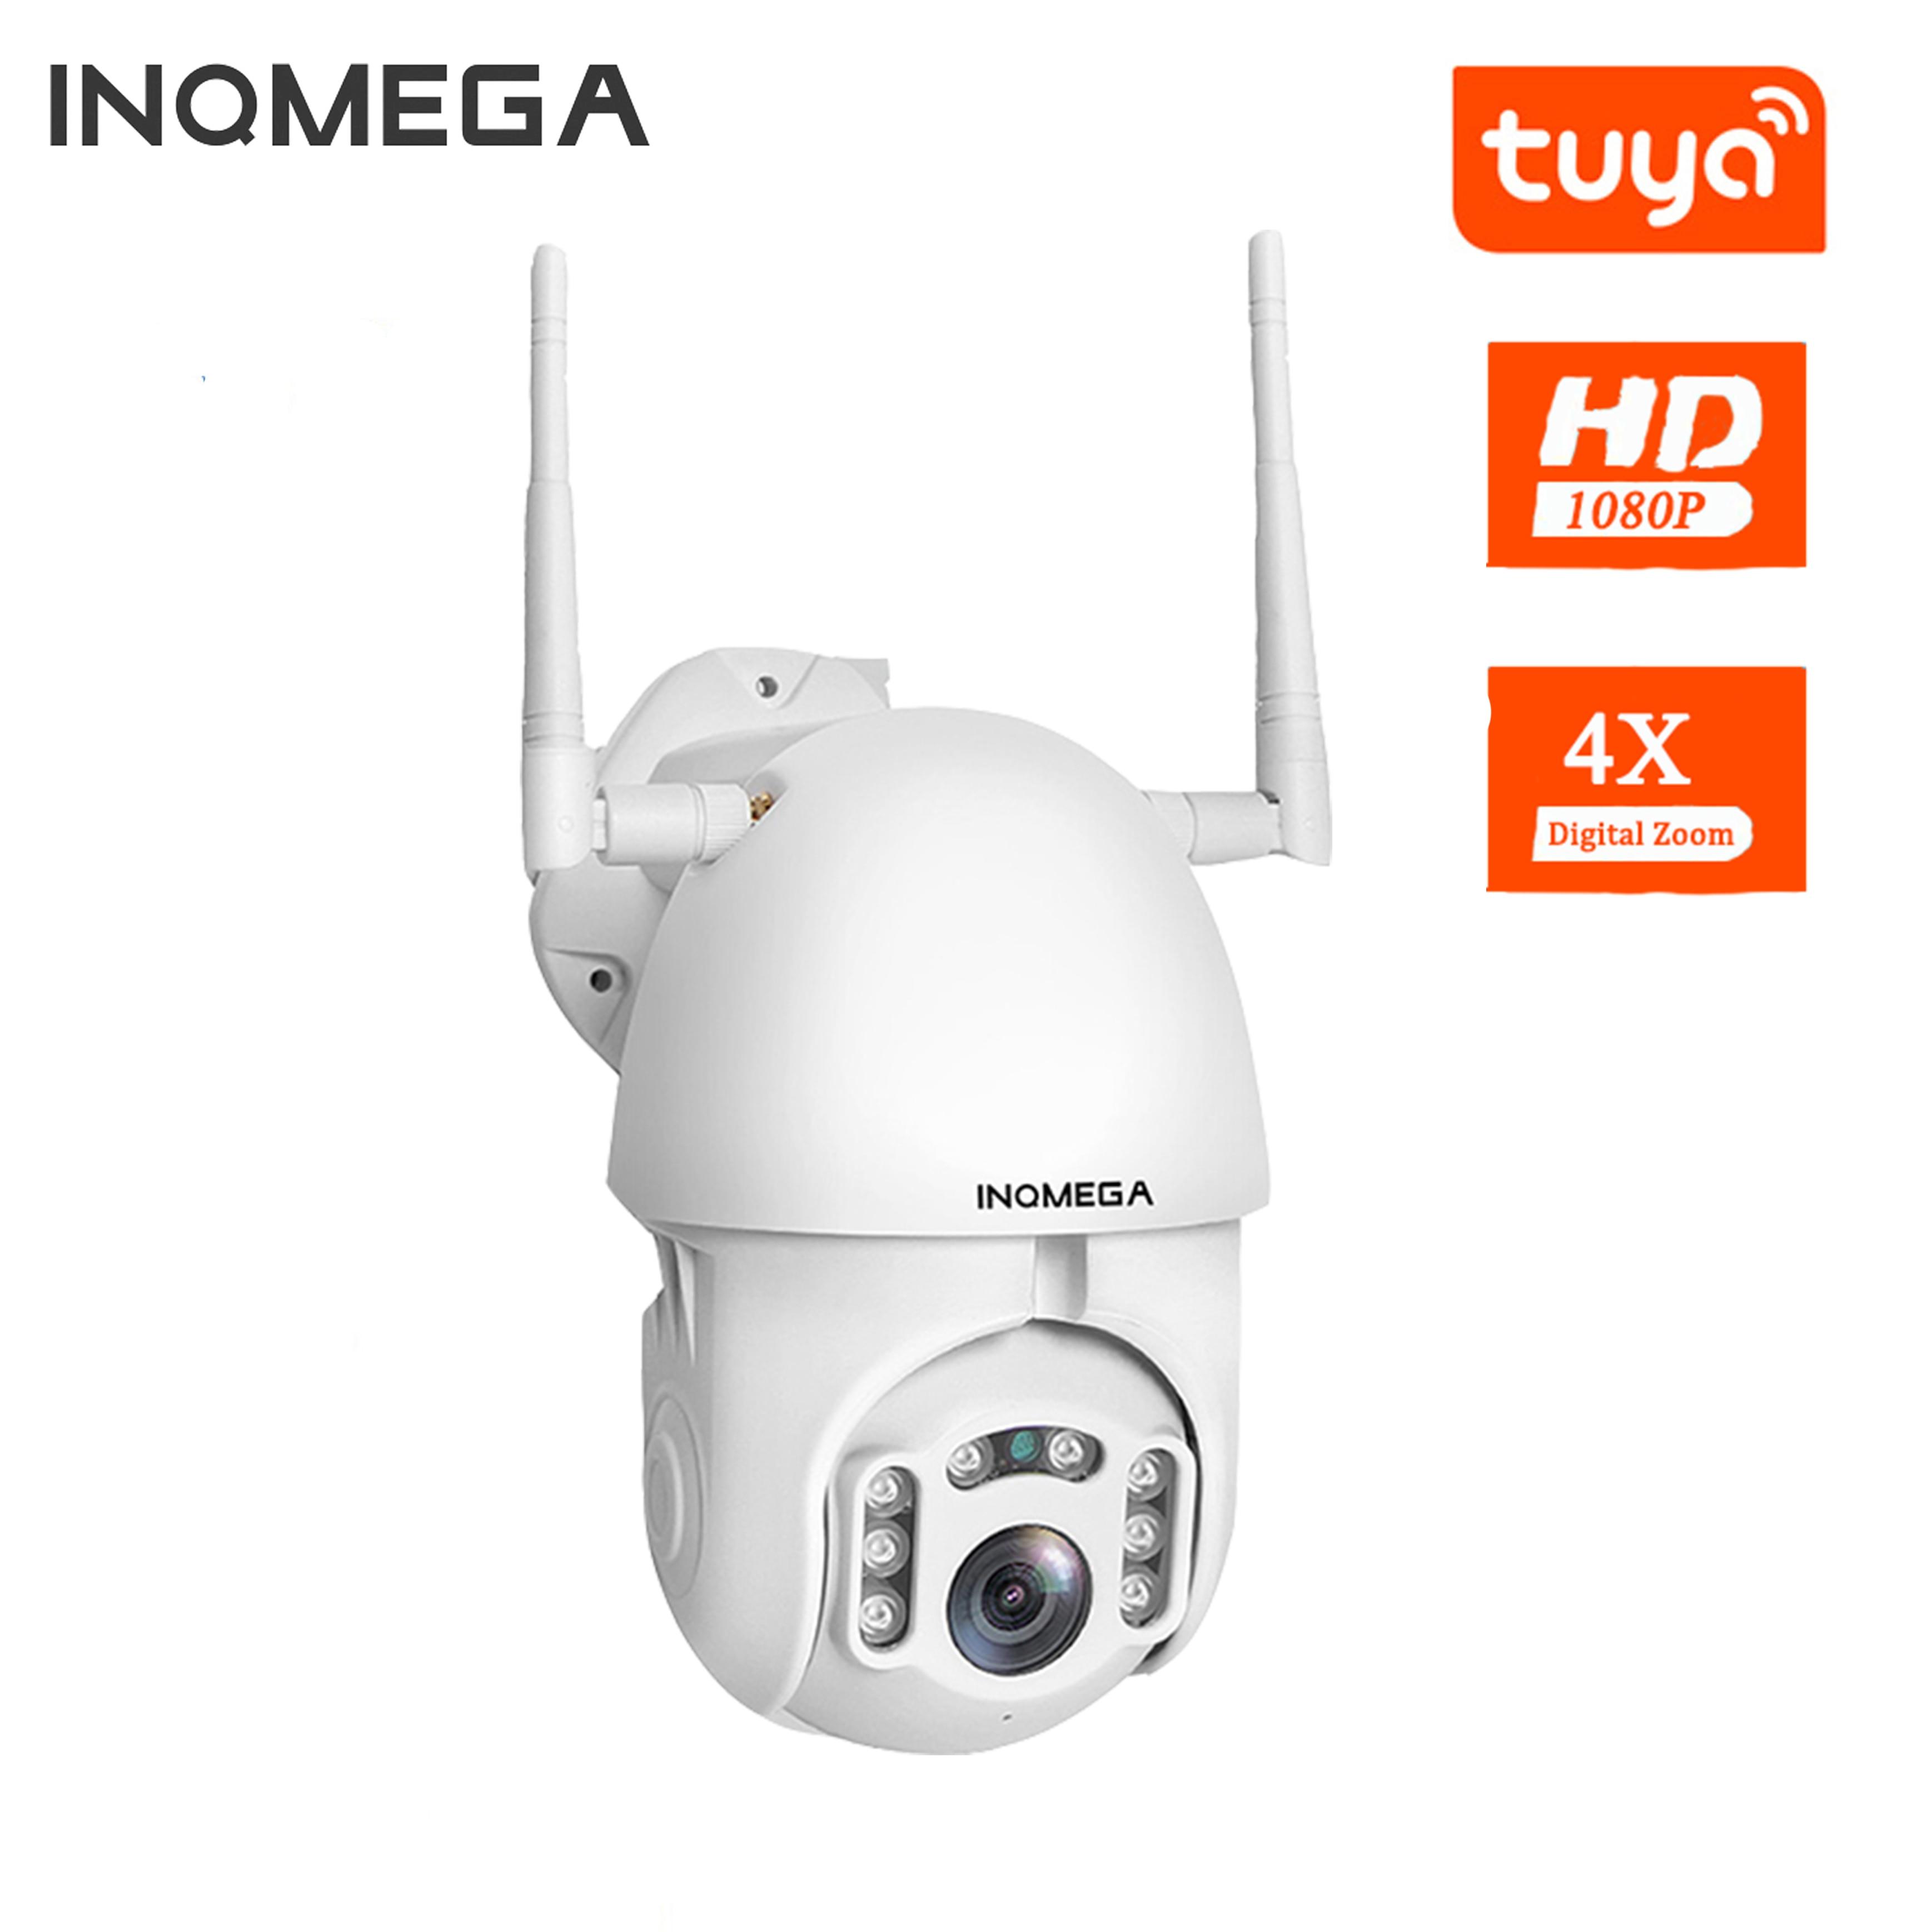 INQMEGA 1080P IP Camera WiFi Wireless Auto Tracking PTZ Speed Dome Camera Outdoor Security Surveillance Waterproof Camera TUYA